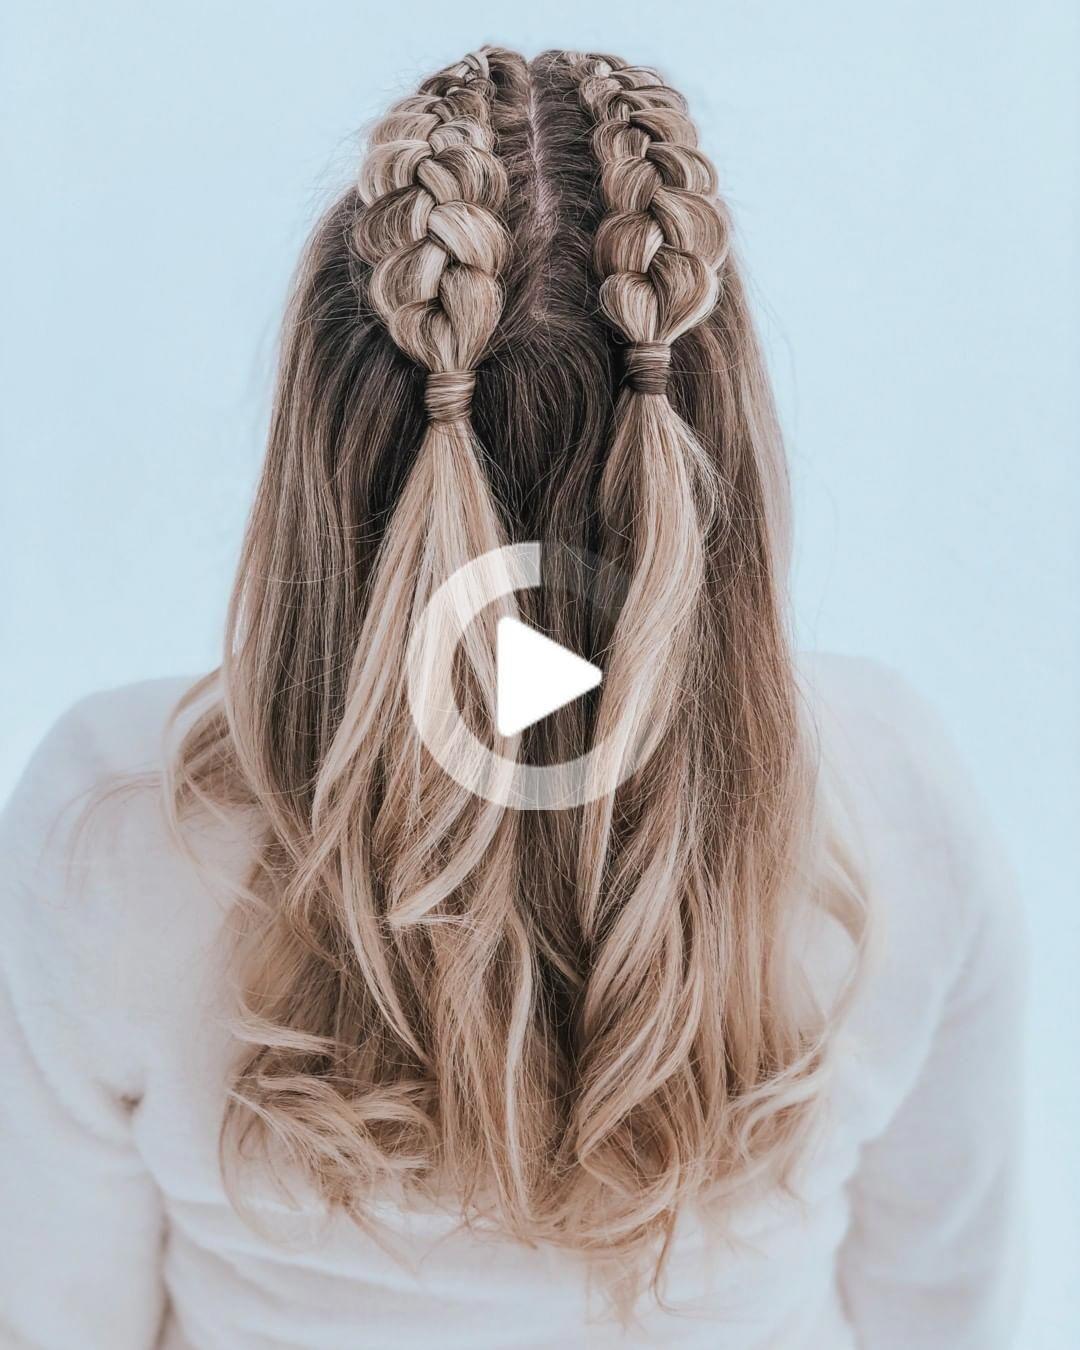 Peinados Tumblr Frisuren Tumblr Peinados Tumblr Fingercoilsnaturalhair In 2020 Medium Length Hair Styles Hair Styles Diy Hairstyles Easy